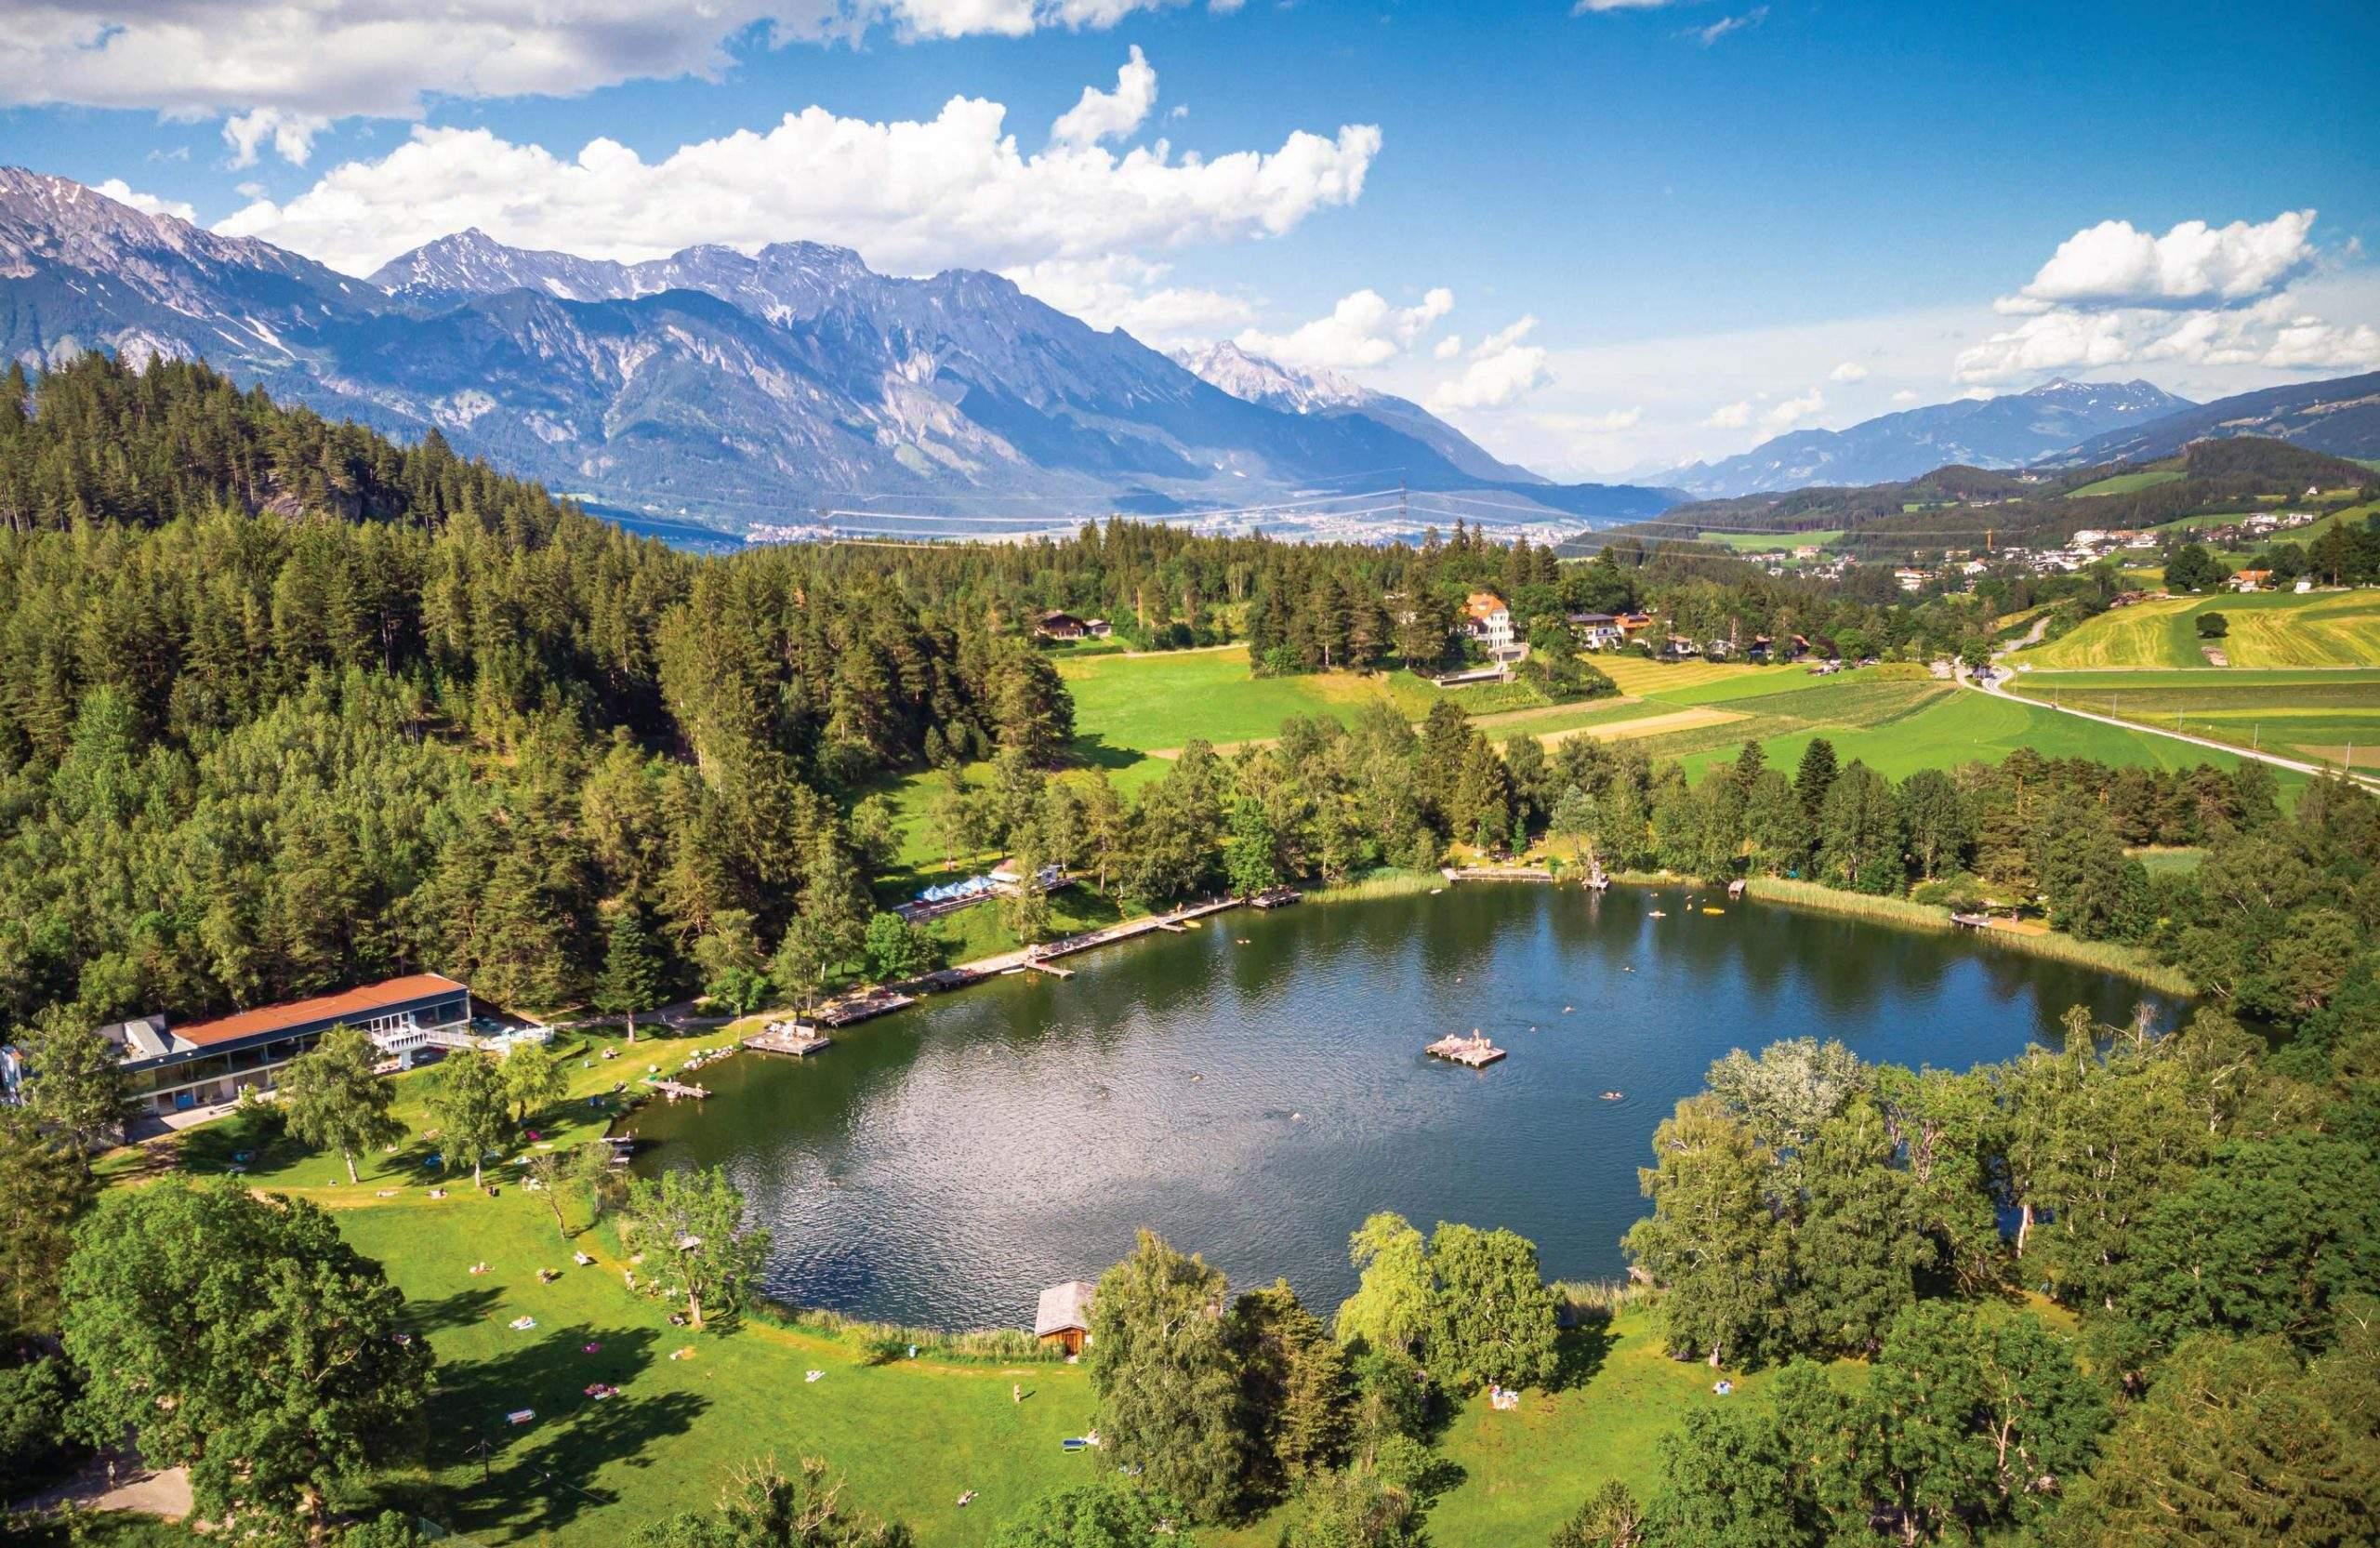 Lansersee Innsbruck